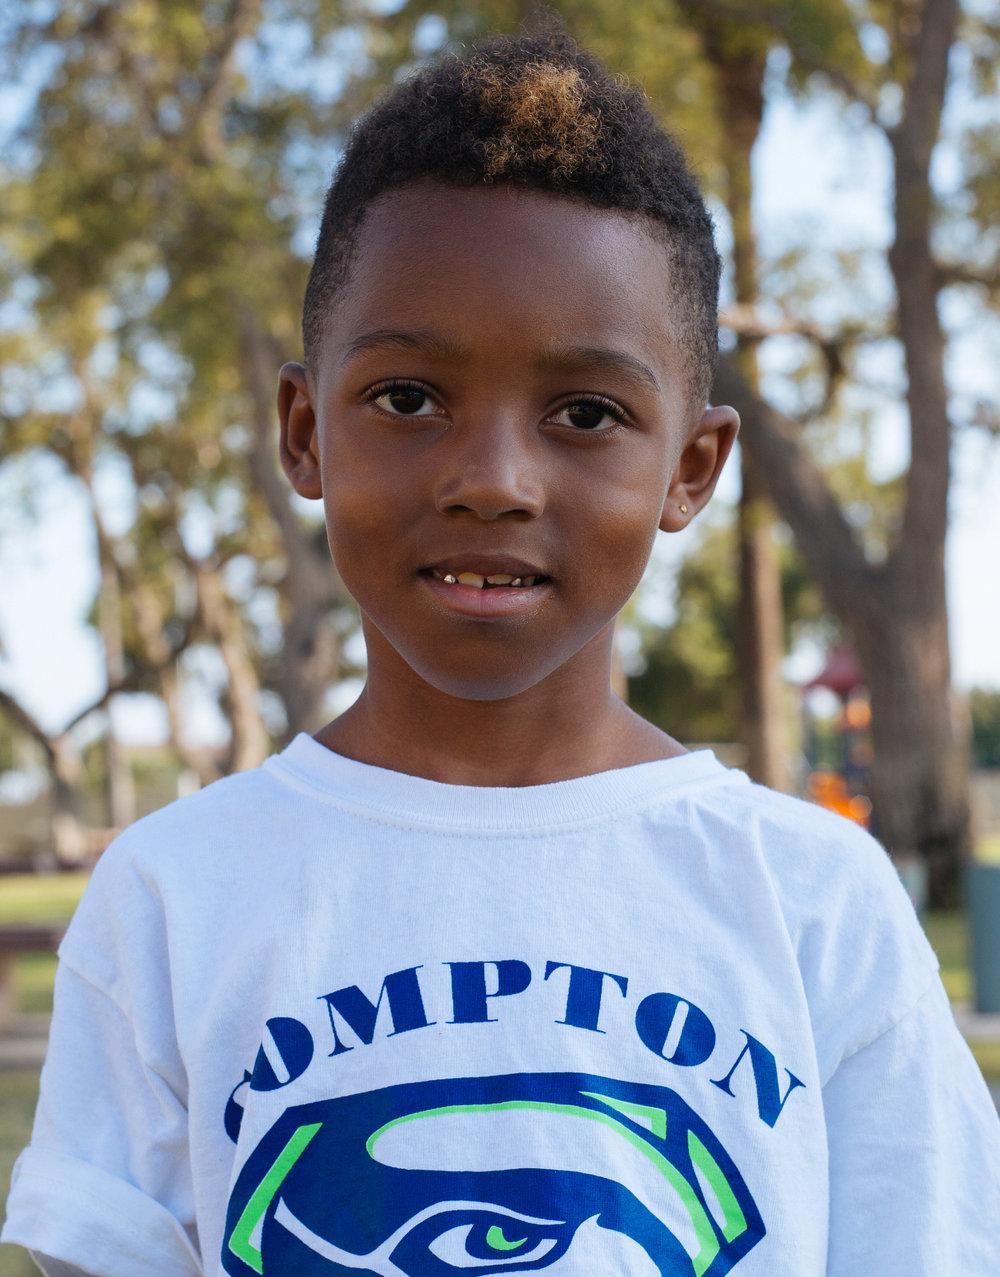 Child at the park, Compton, California 2016